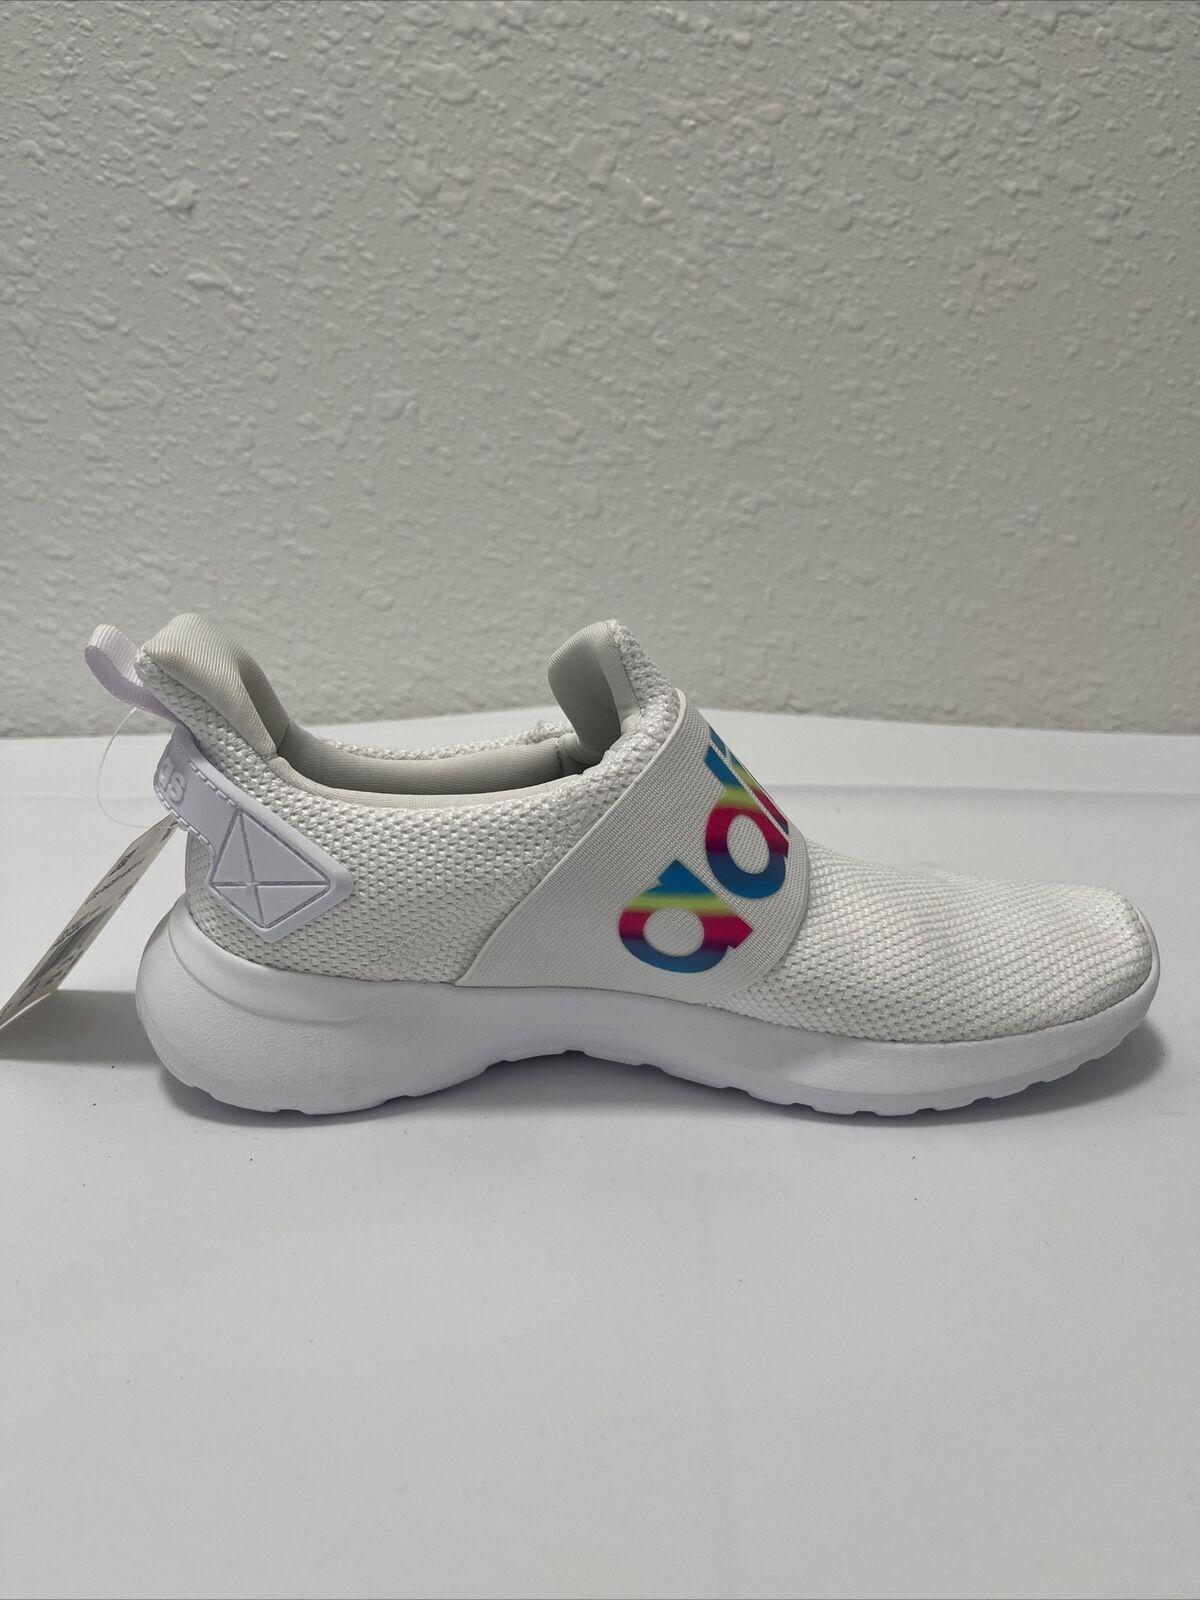 adidas Lite Race ADAPT K White Running Shoes 6